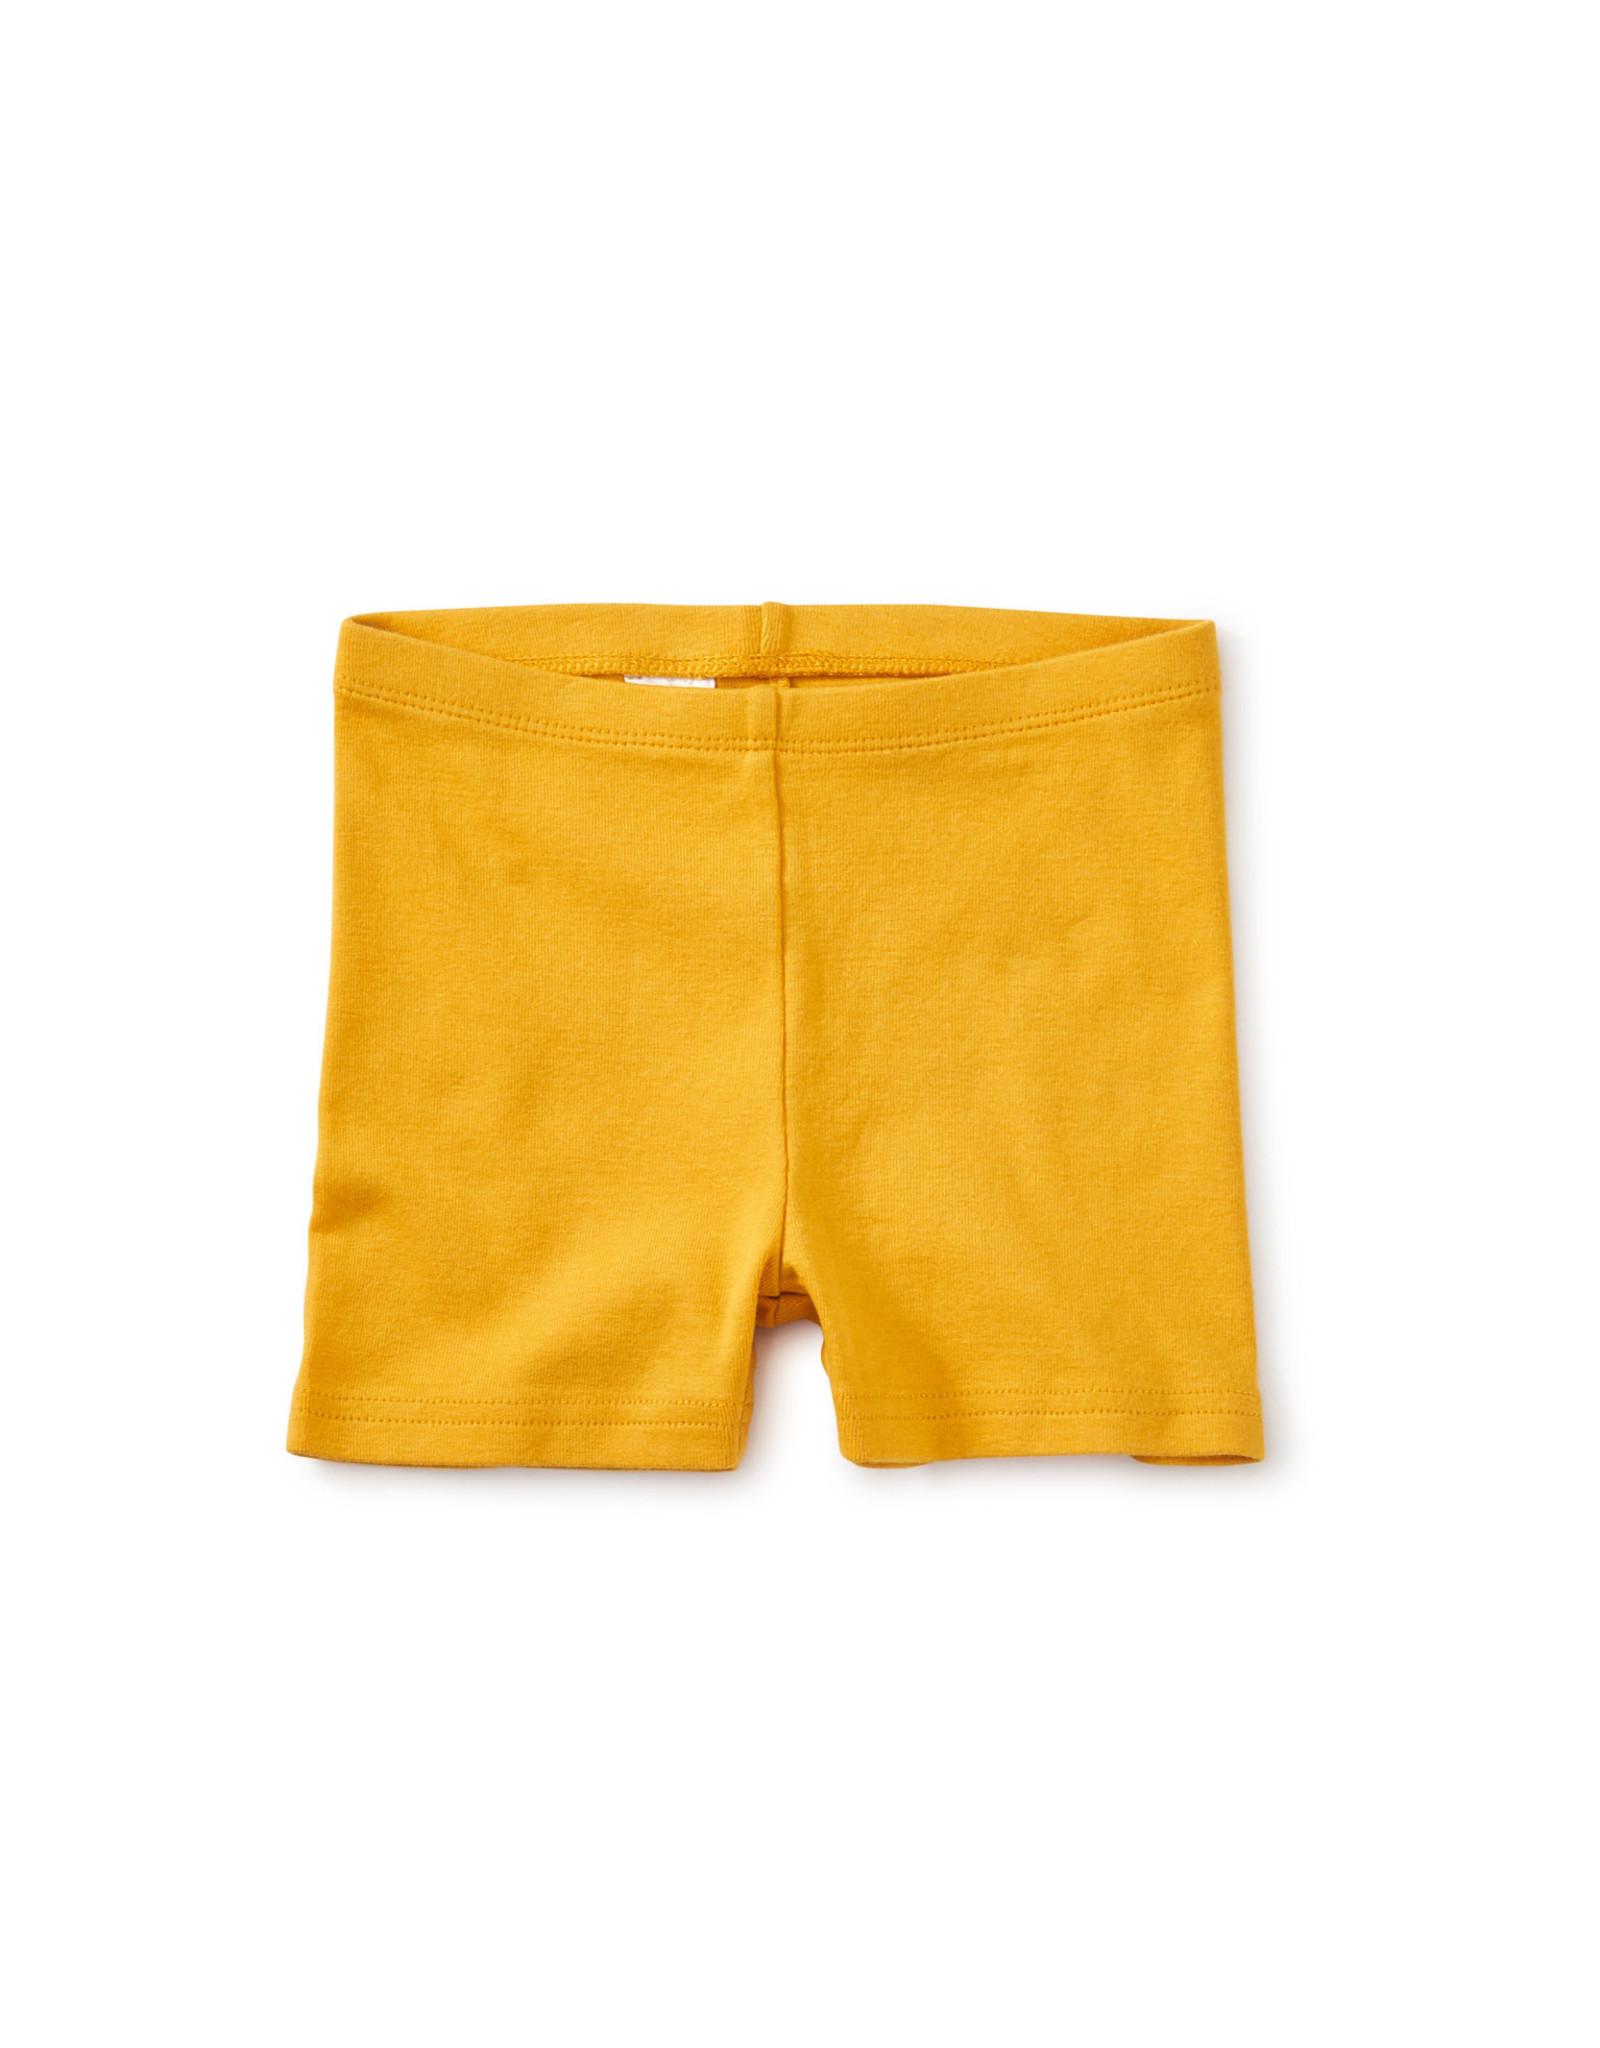 Tea Somersault Shorts, Gold